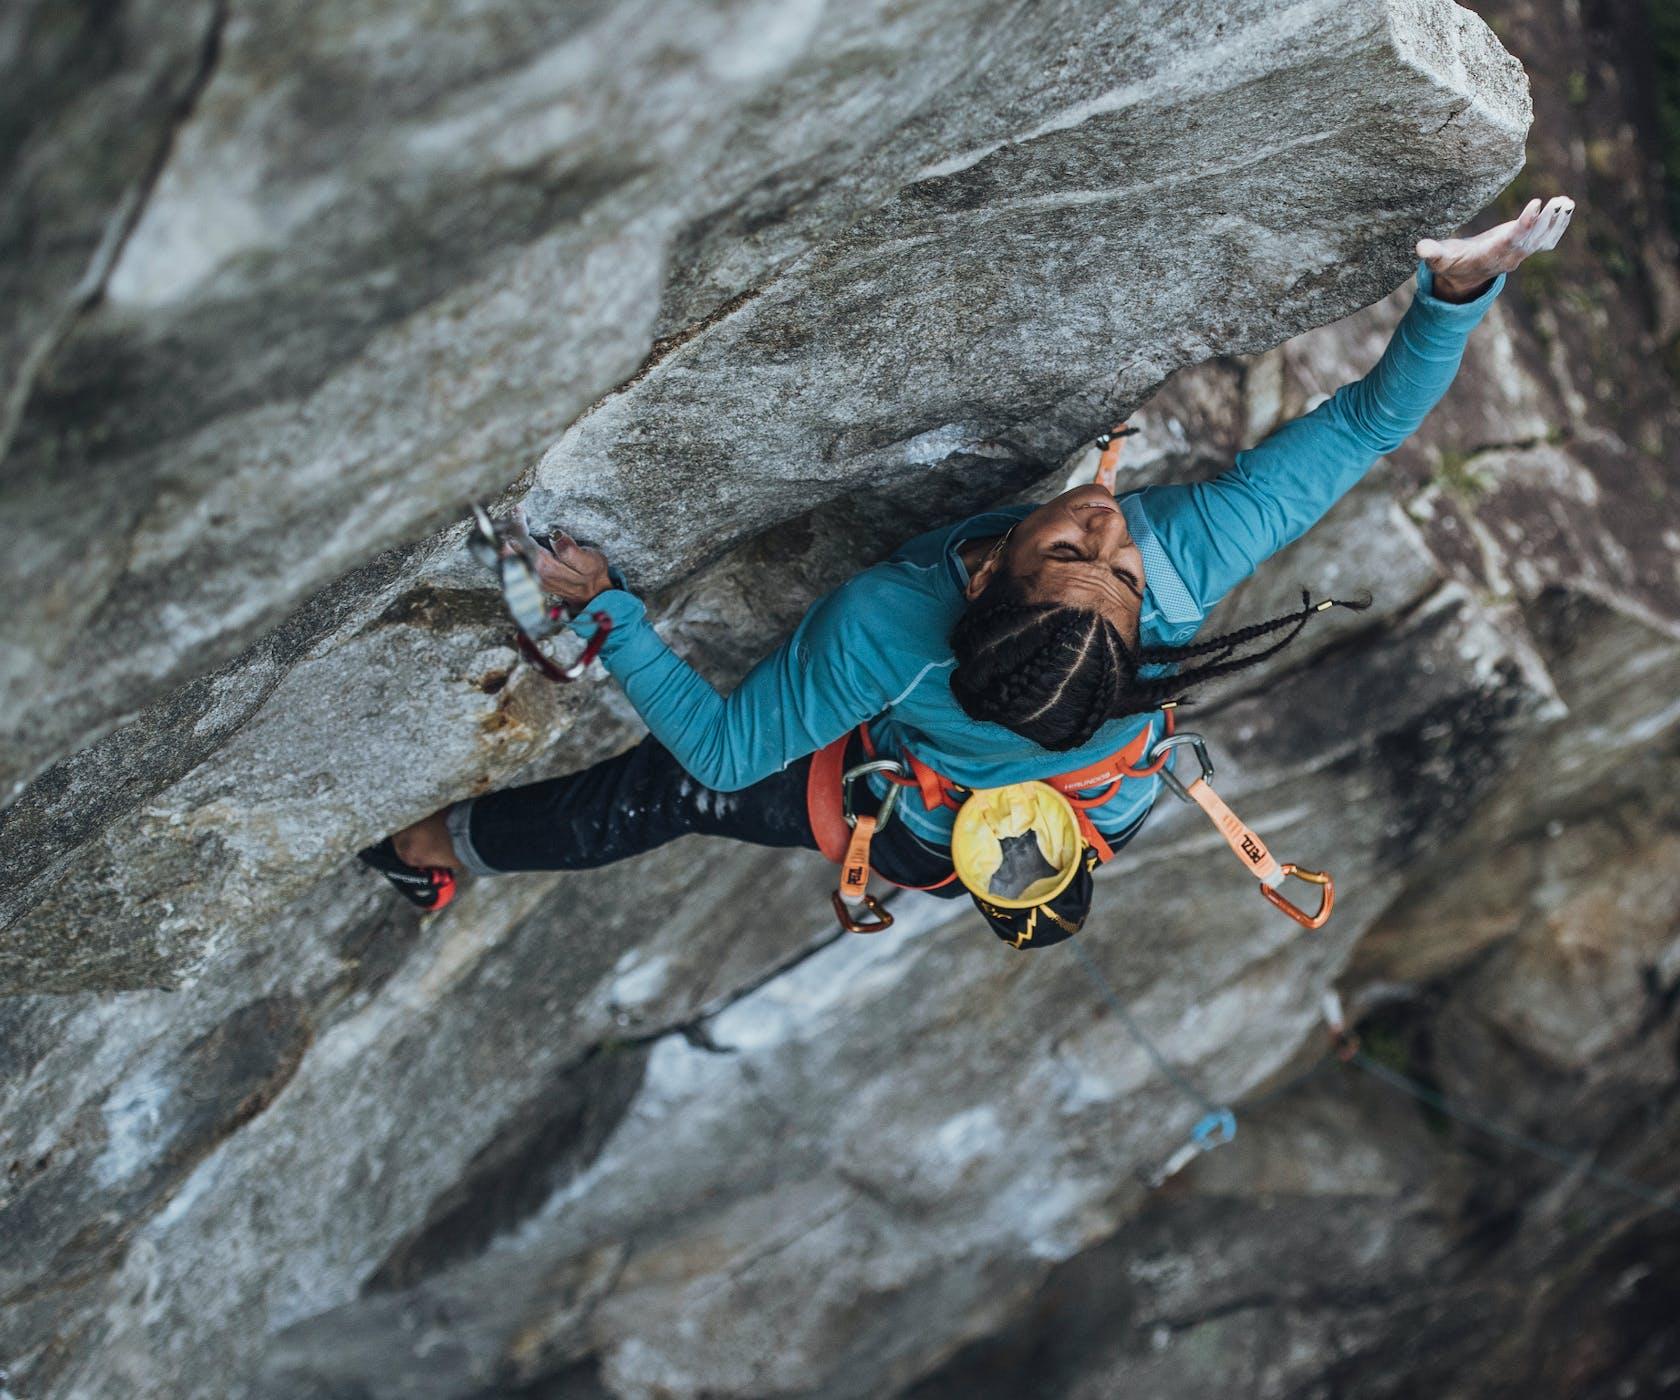 La Sportiva Onlineshop Klettern Bouldern